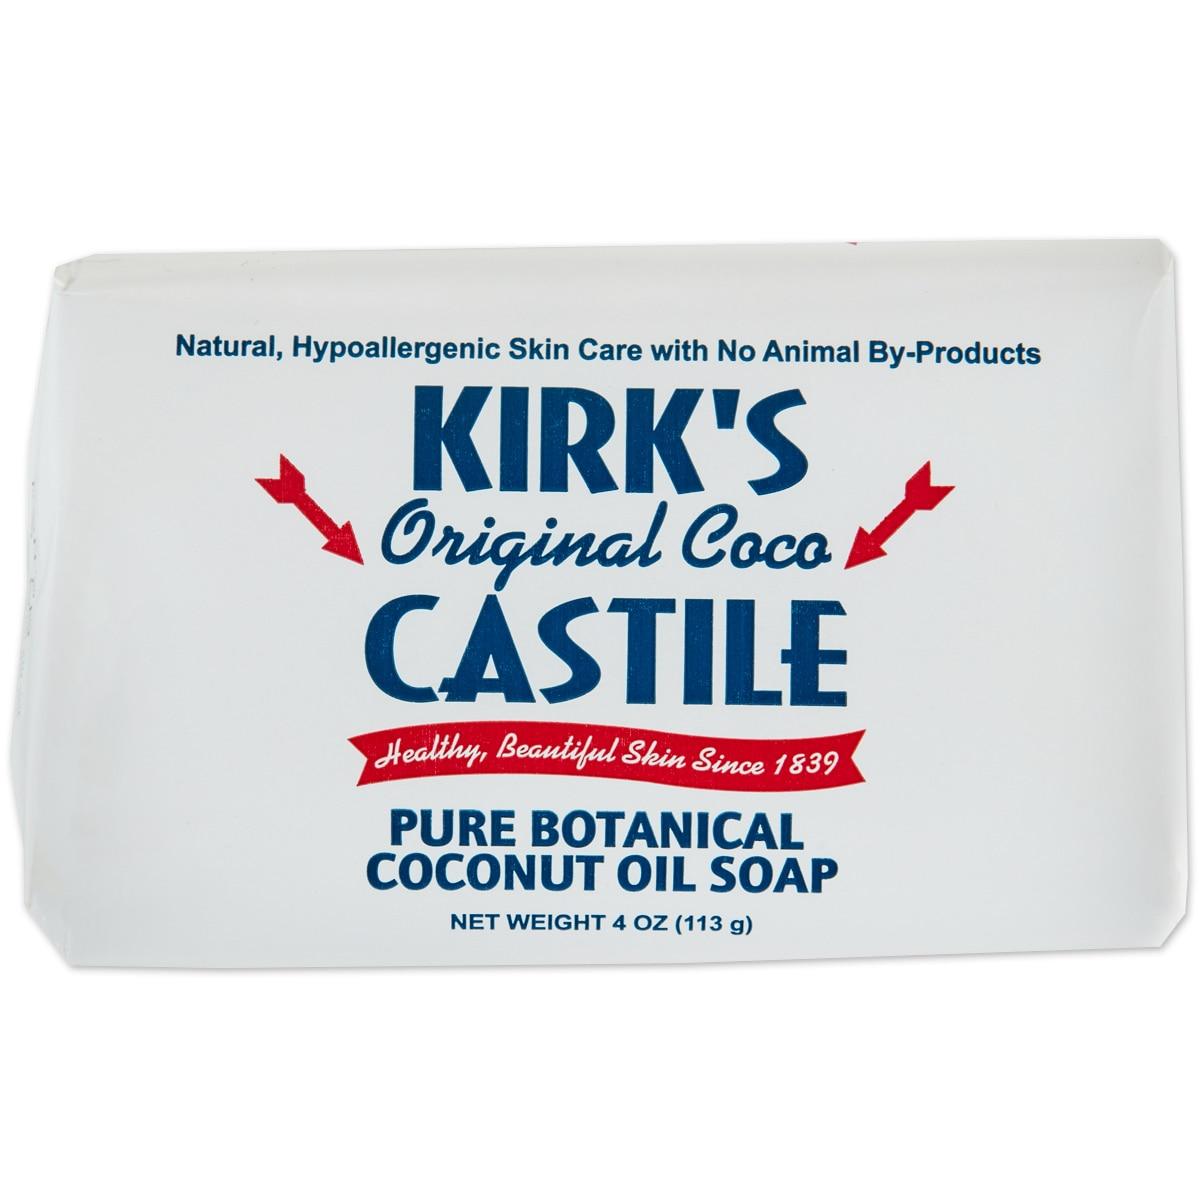 Kirks Coco Castile Bar Soap